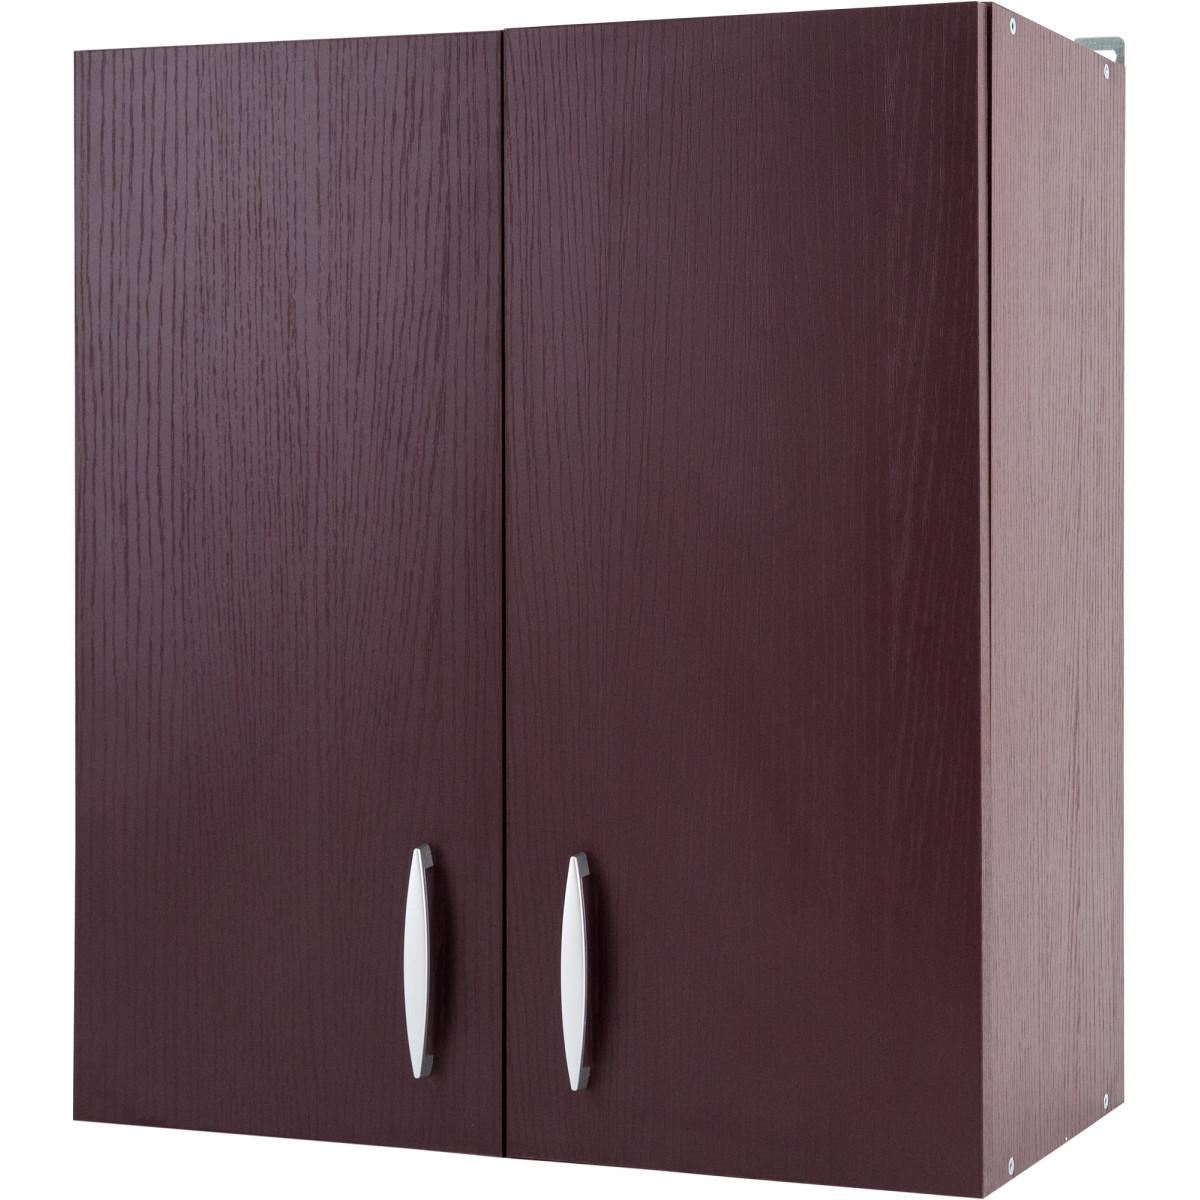 Шкаф навесной Бургун 60x67.6х29 см ЛДСП цвет бургун